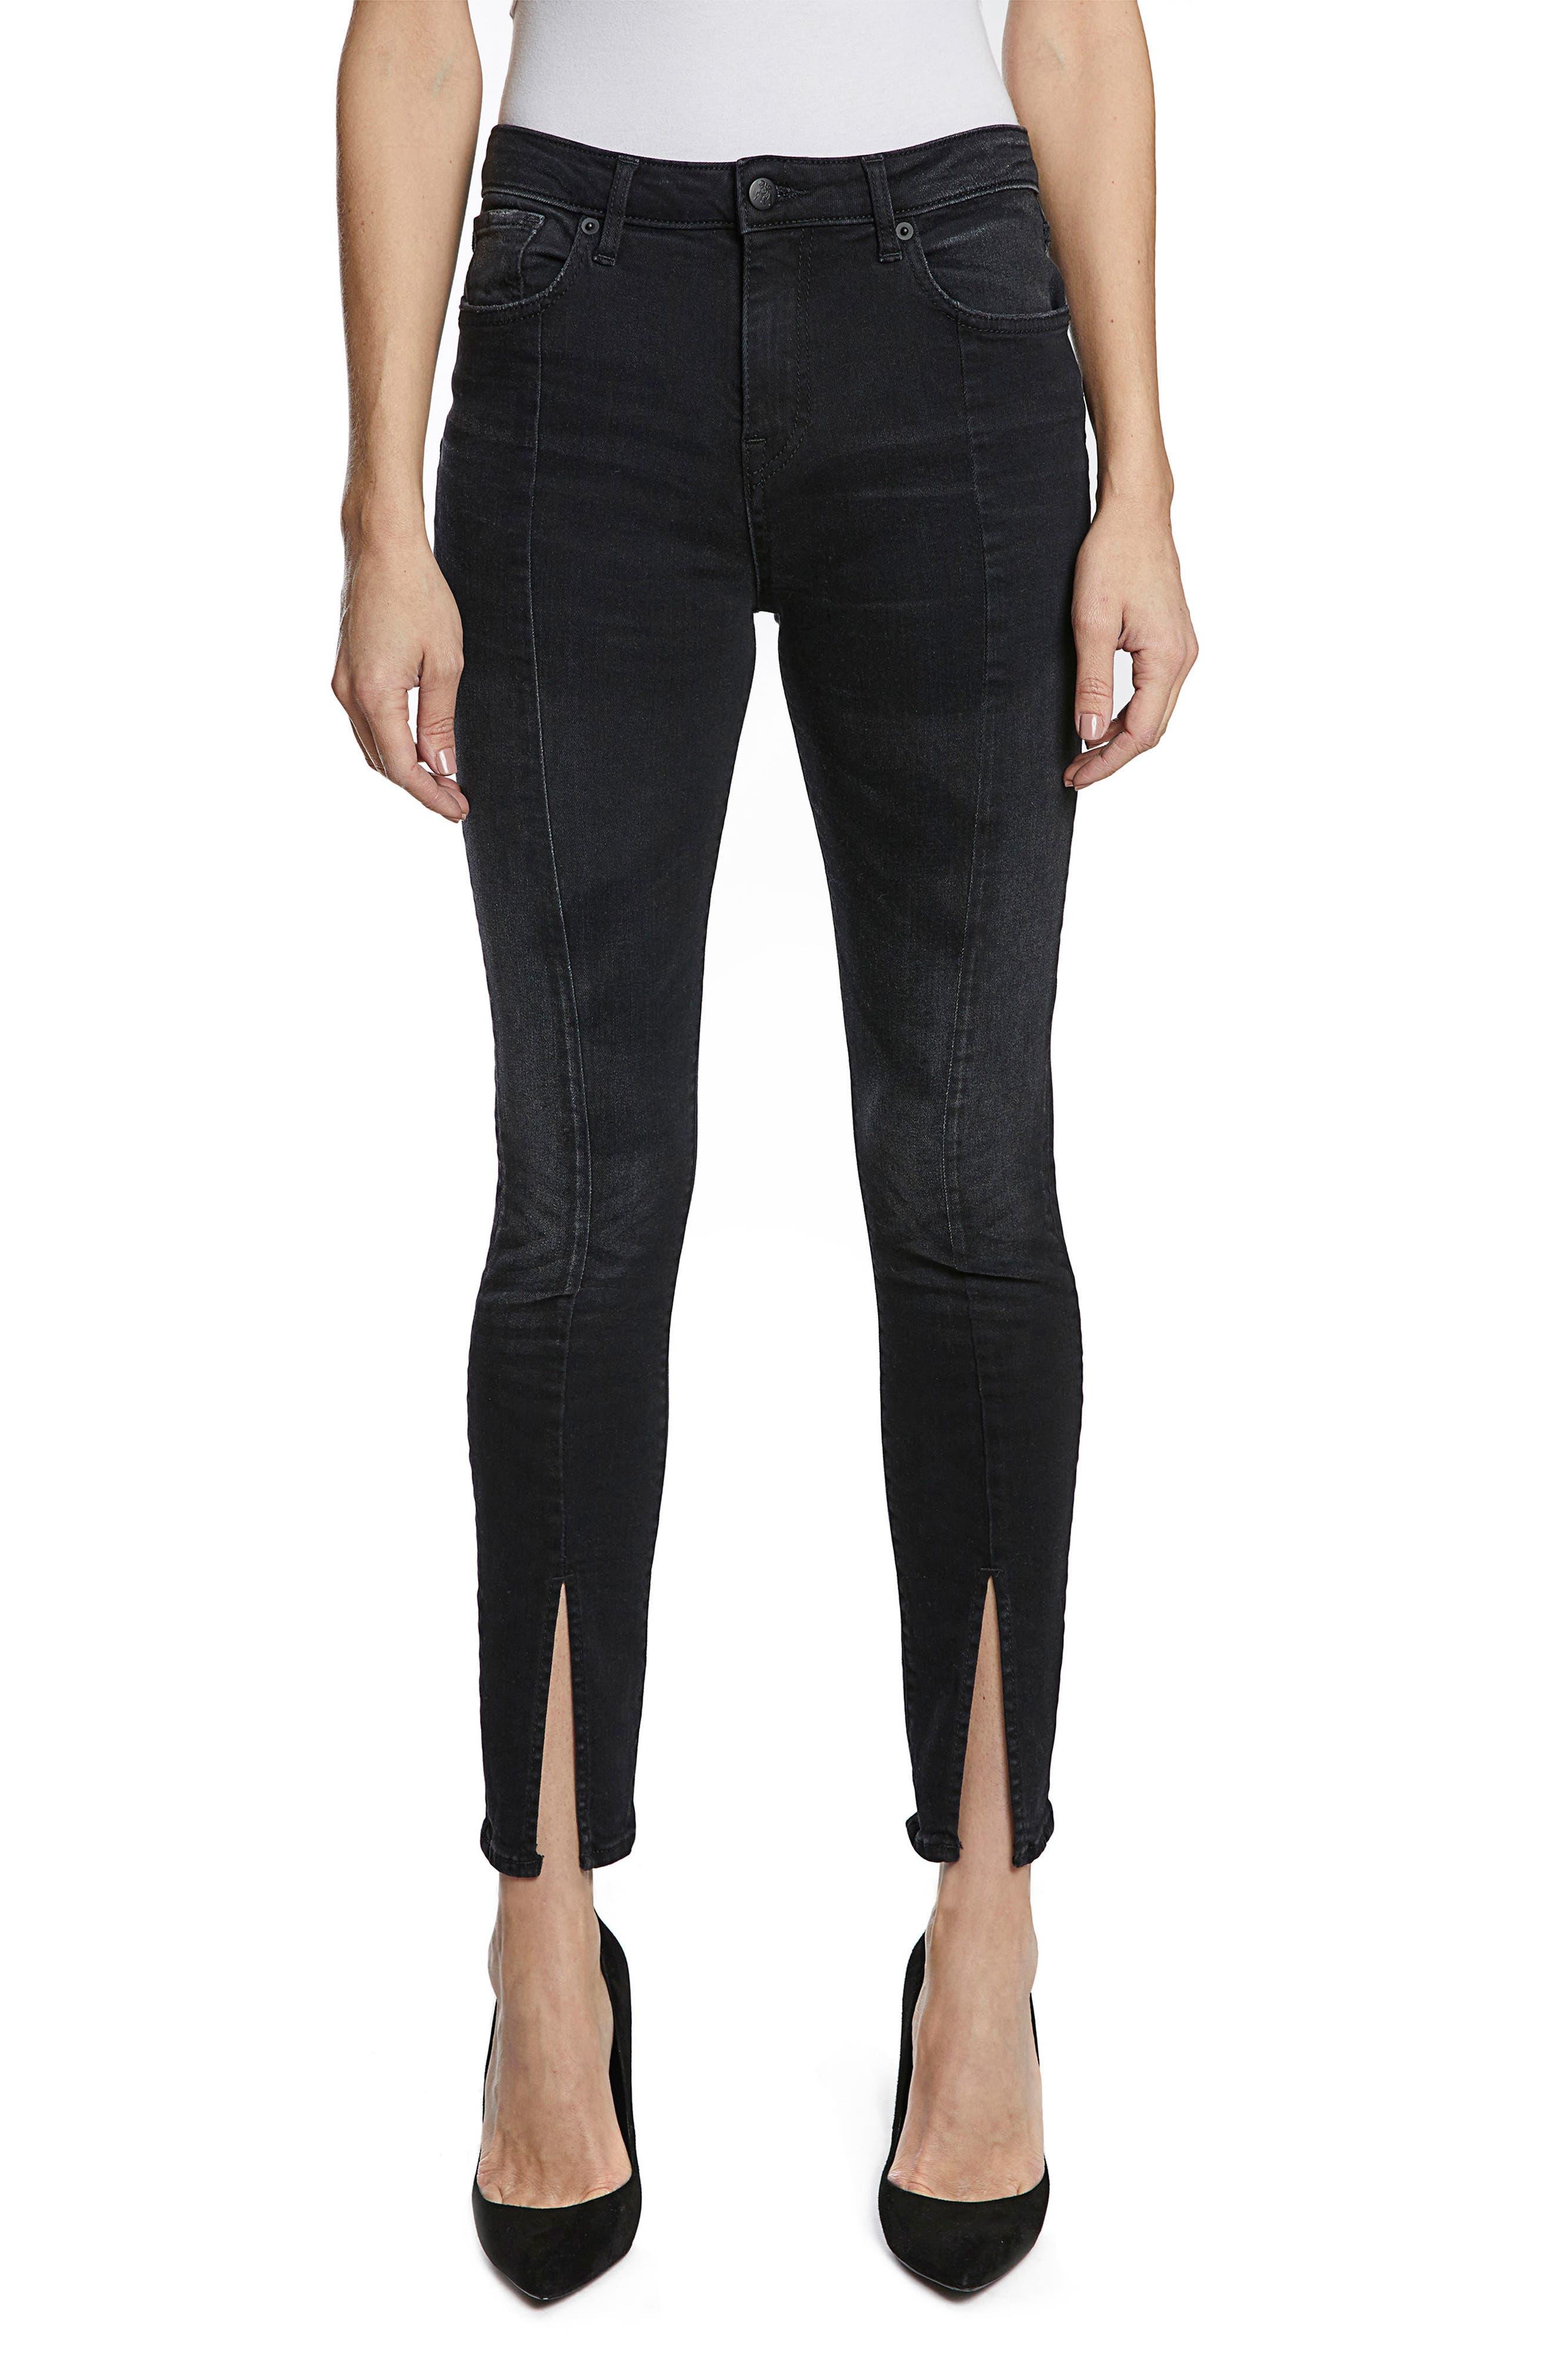 Chevelle Split Ankle Skinny Jeans,                         Main,                         color, Black